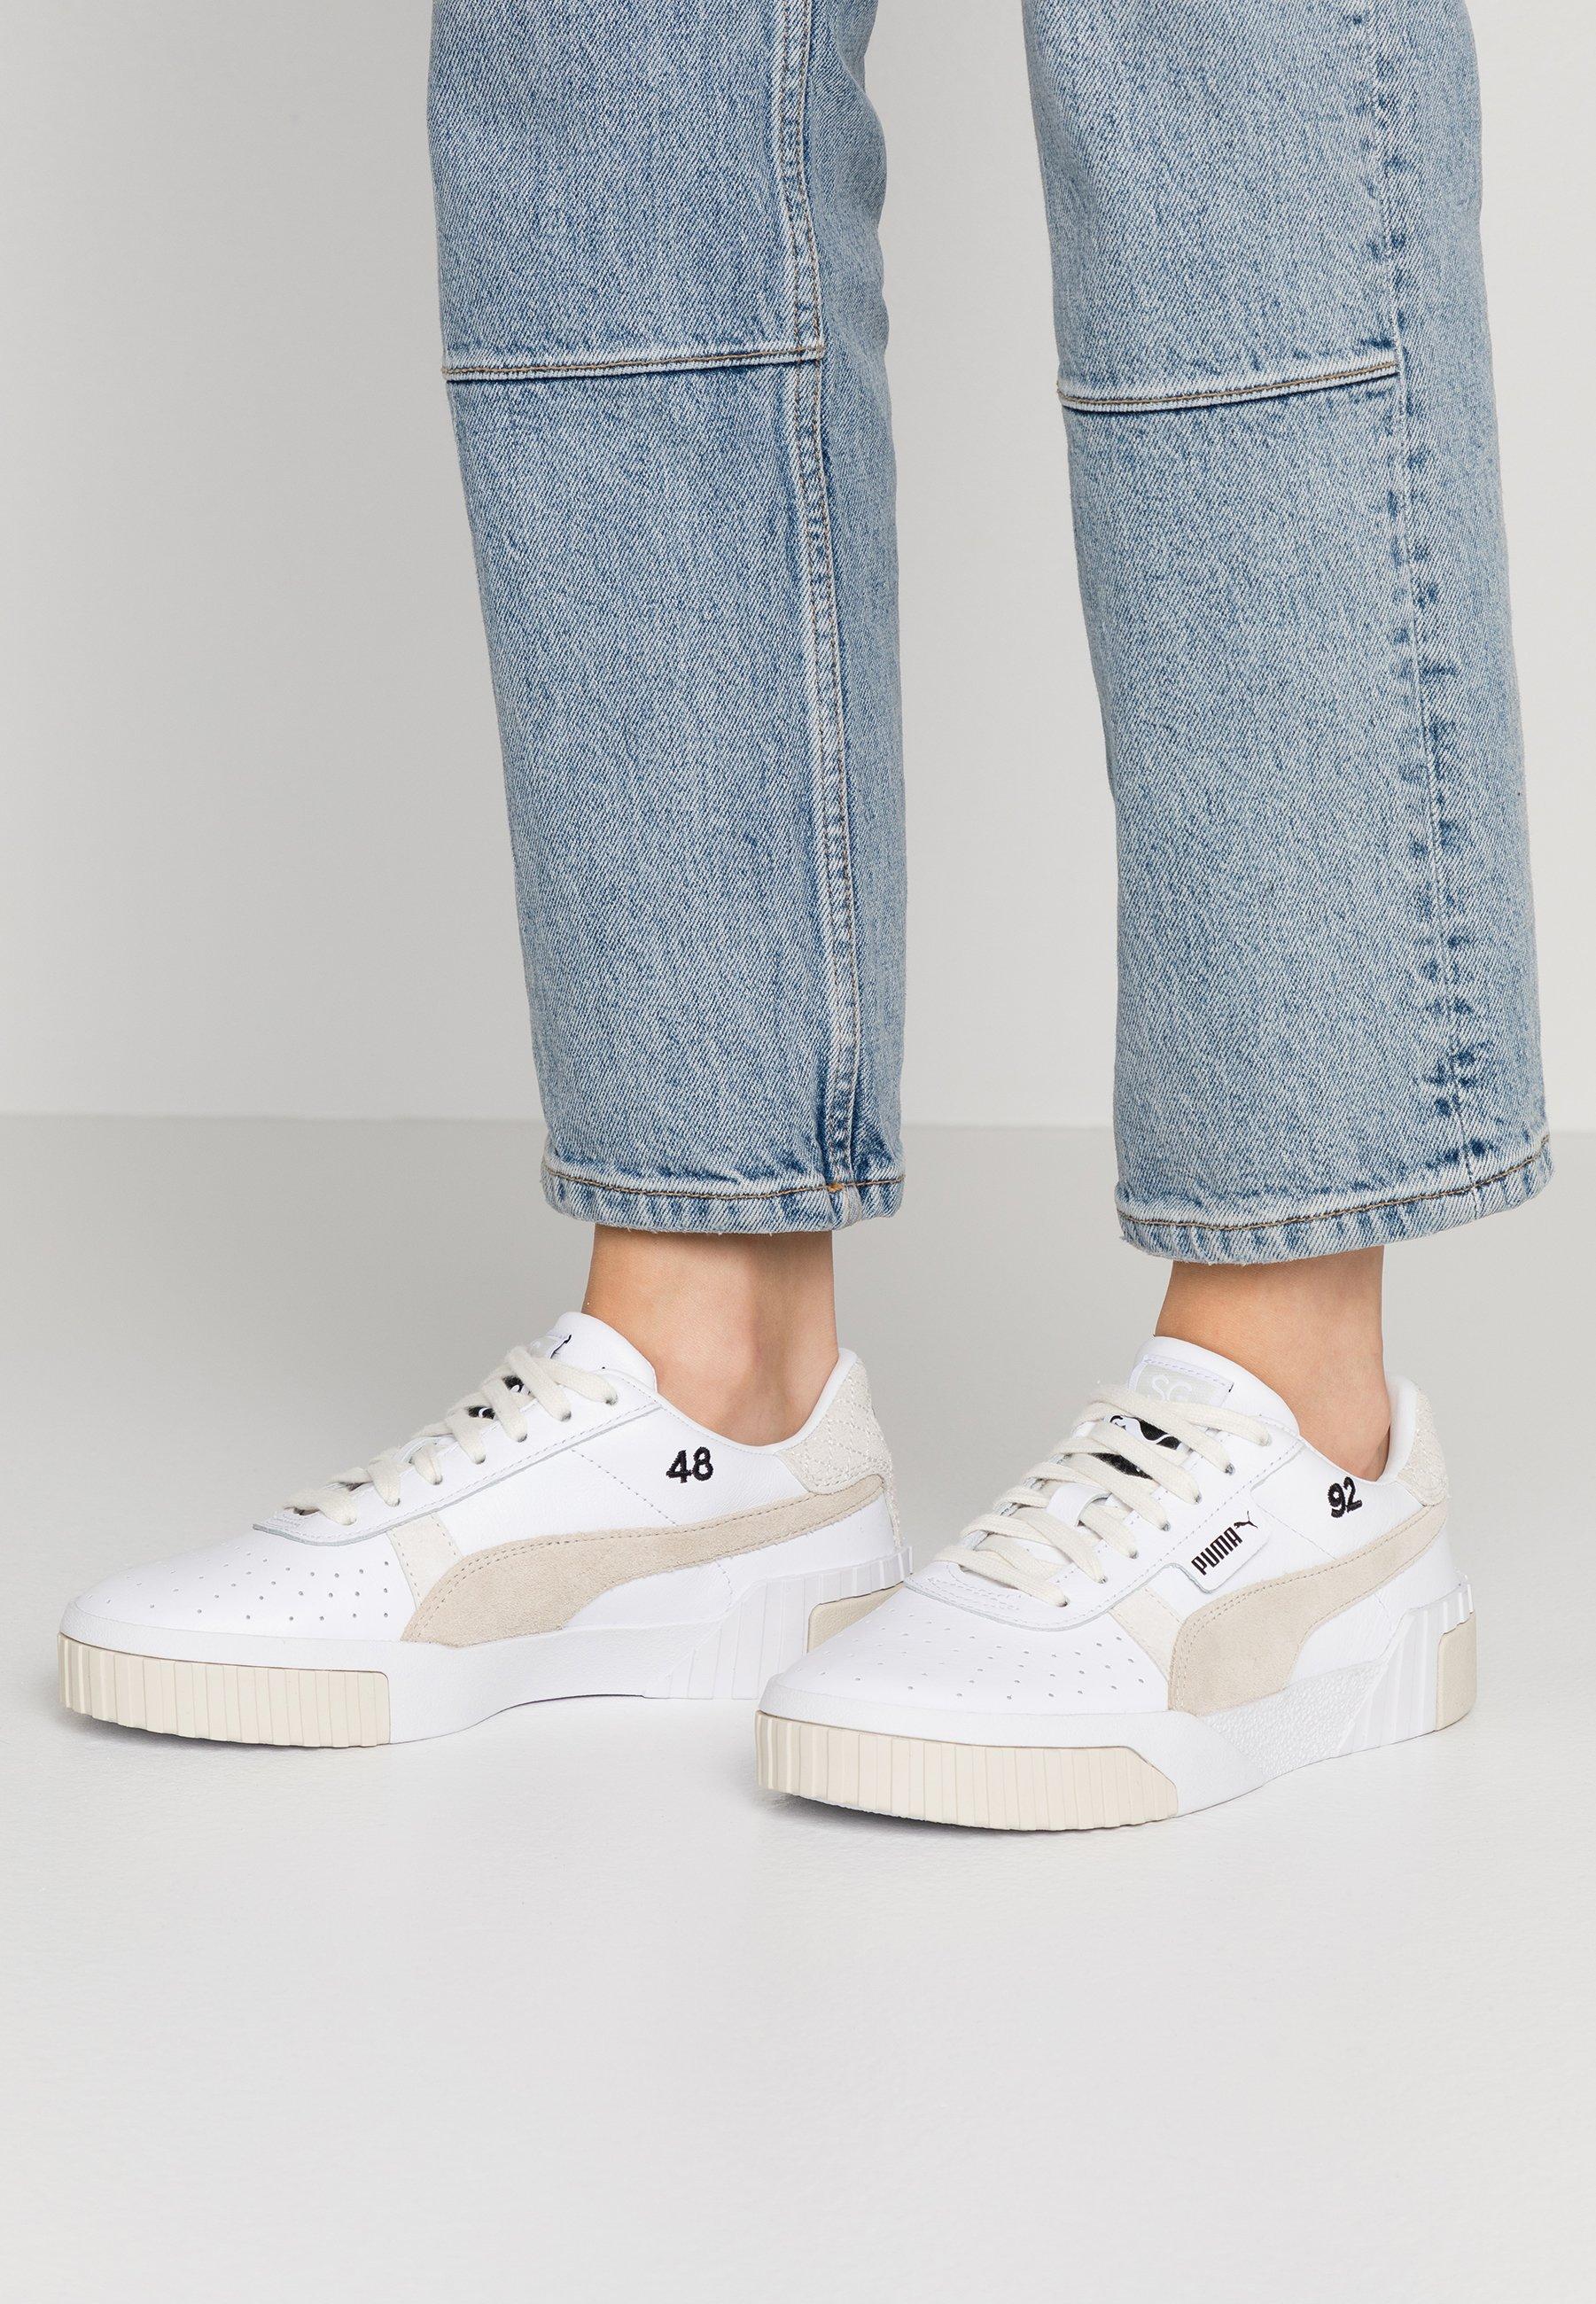 Puma CALI SELENA GOMEZ Sneaker low whitesilver gray